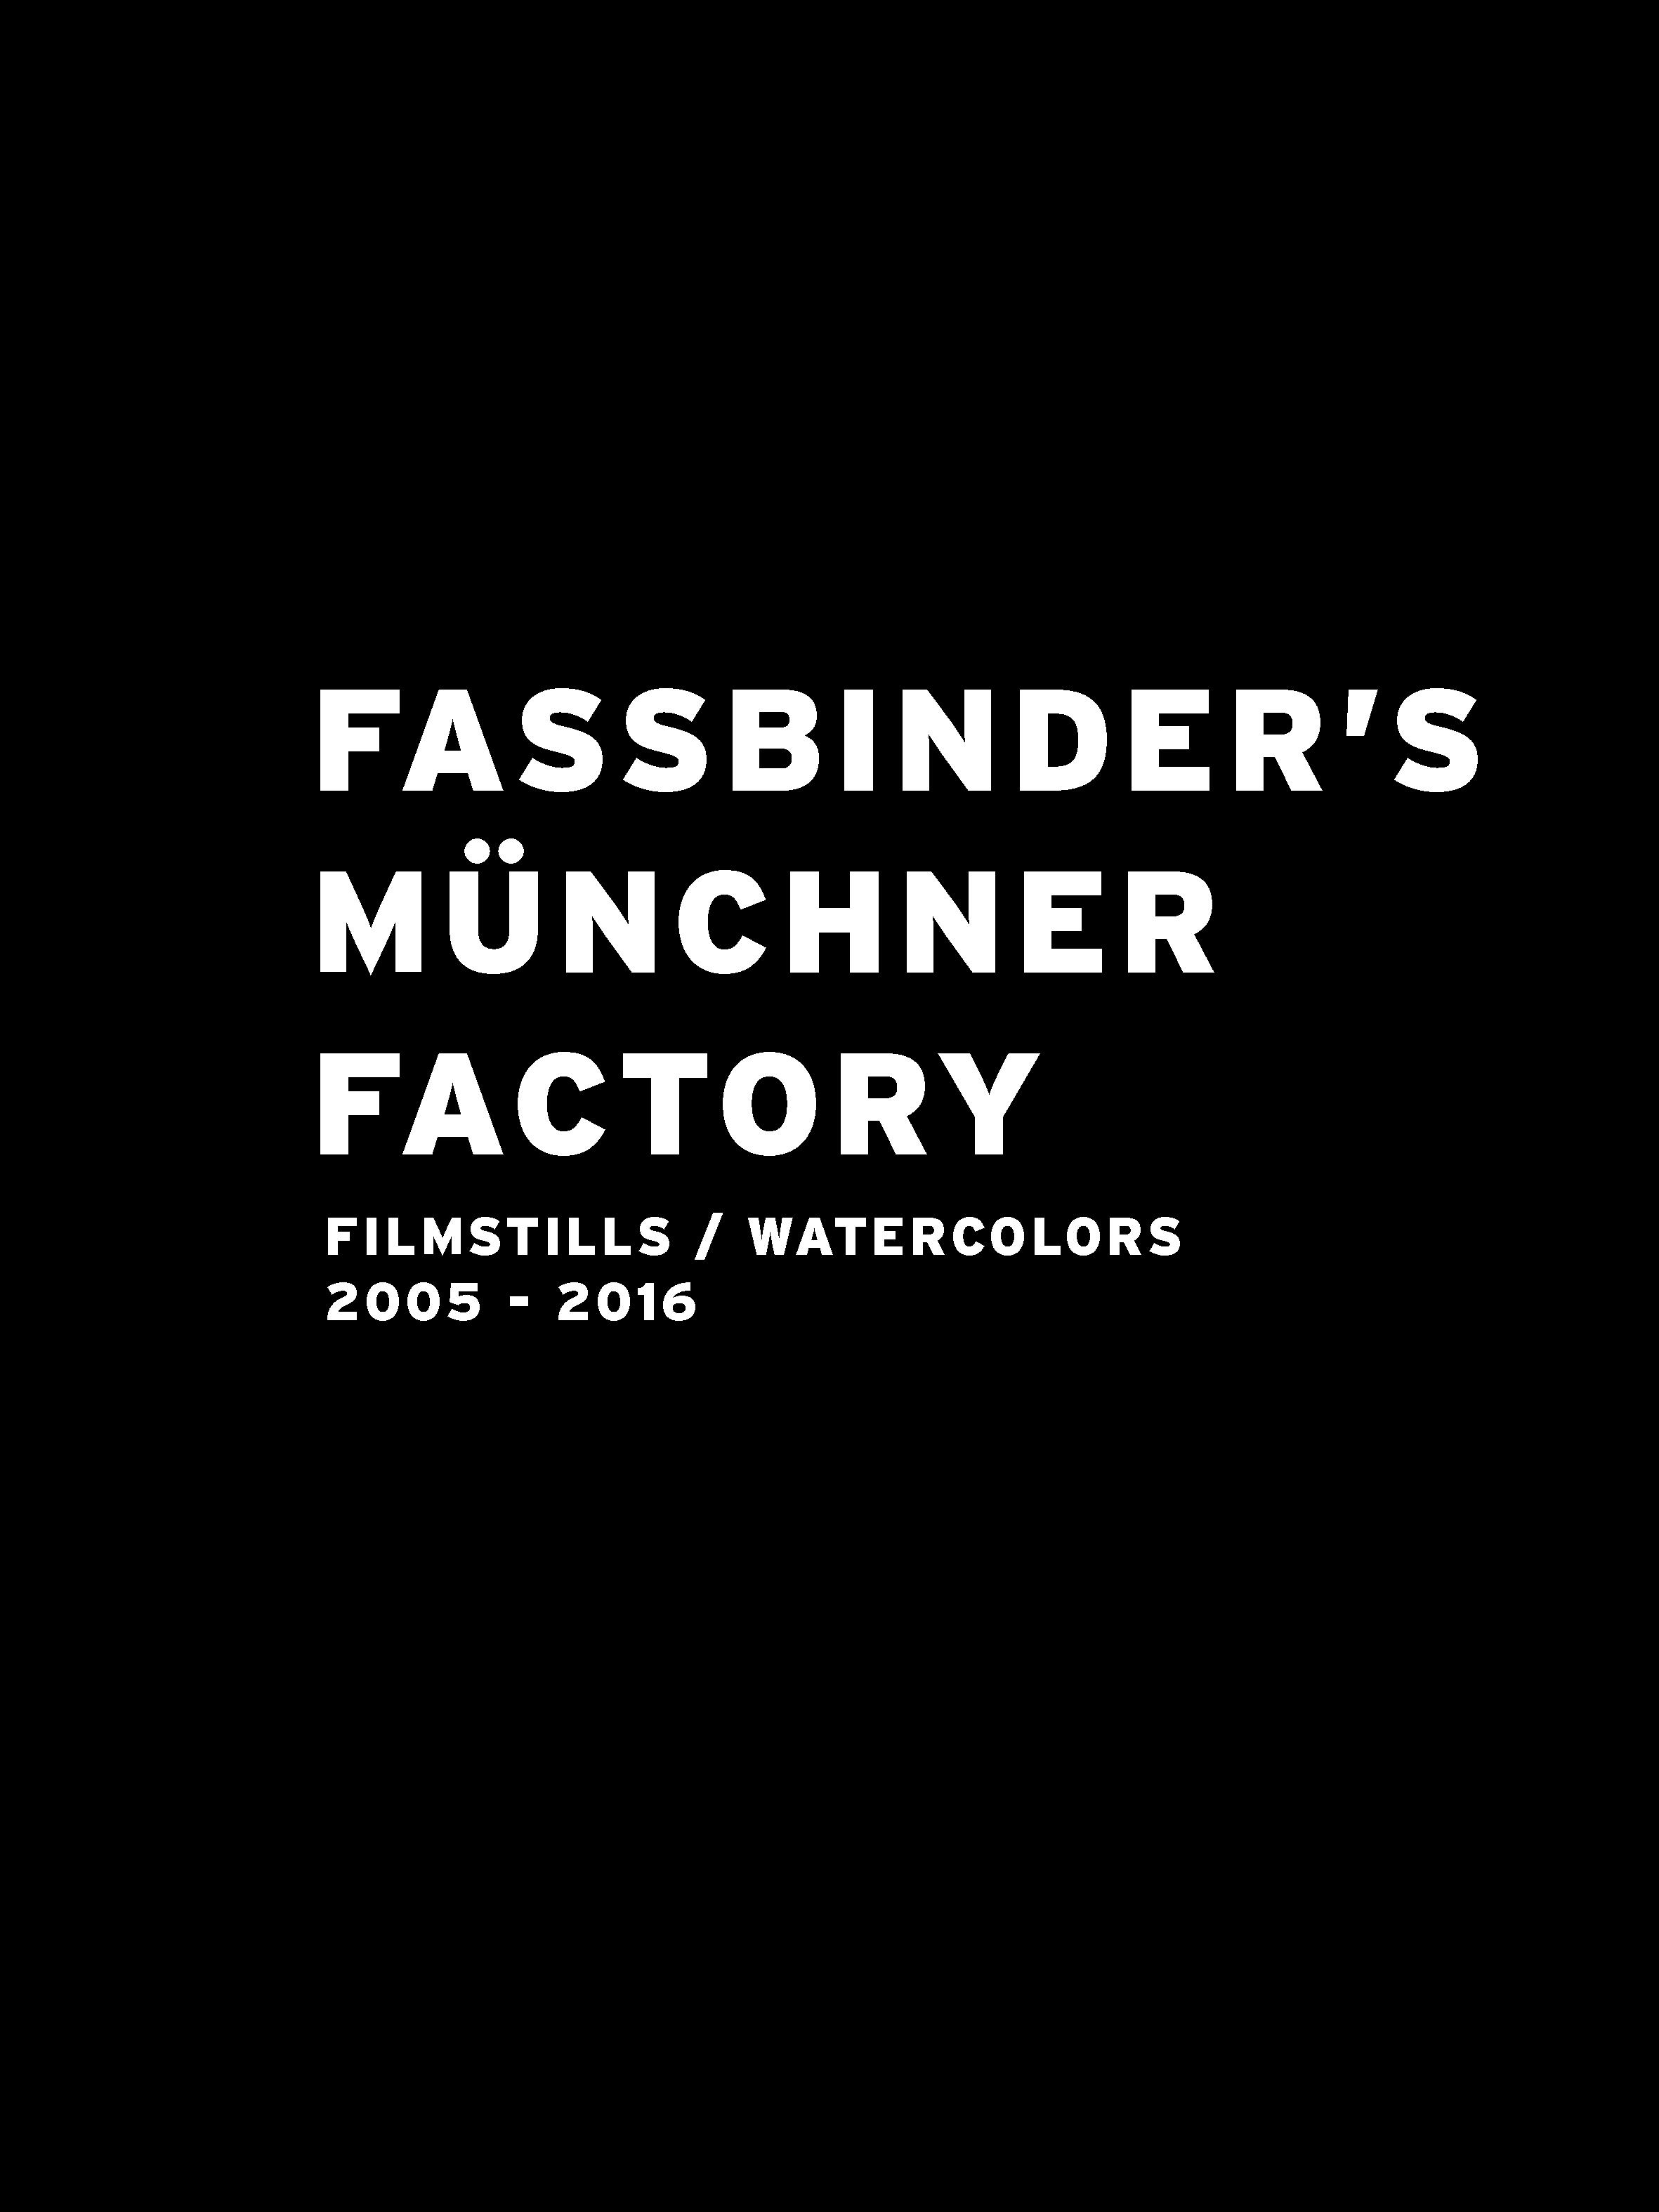 Fassbinder.jpg